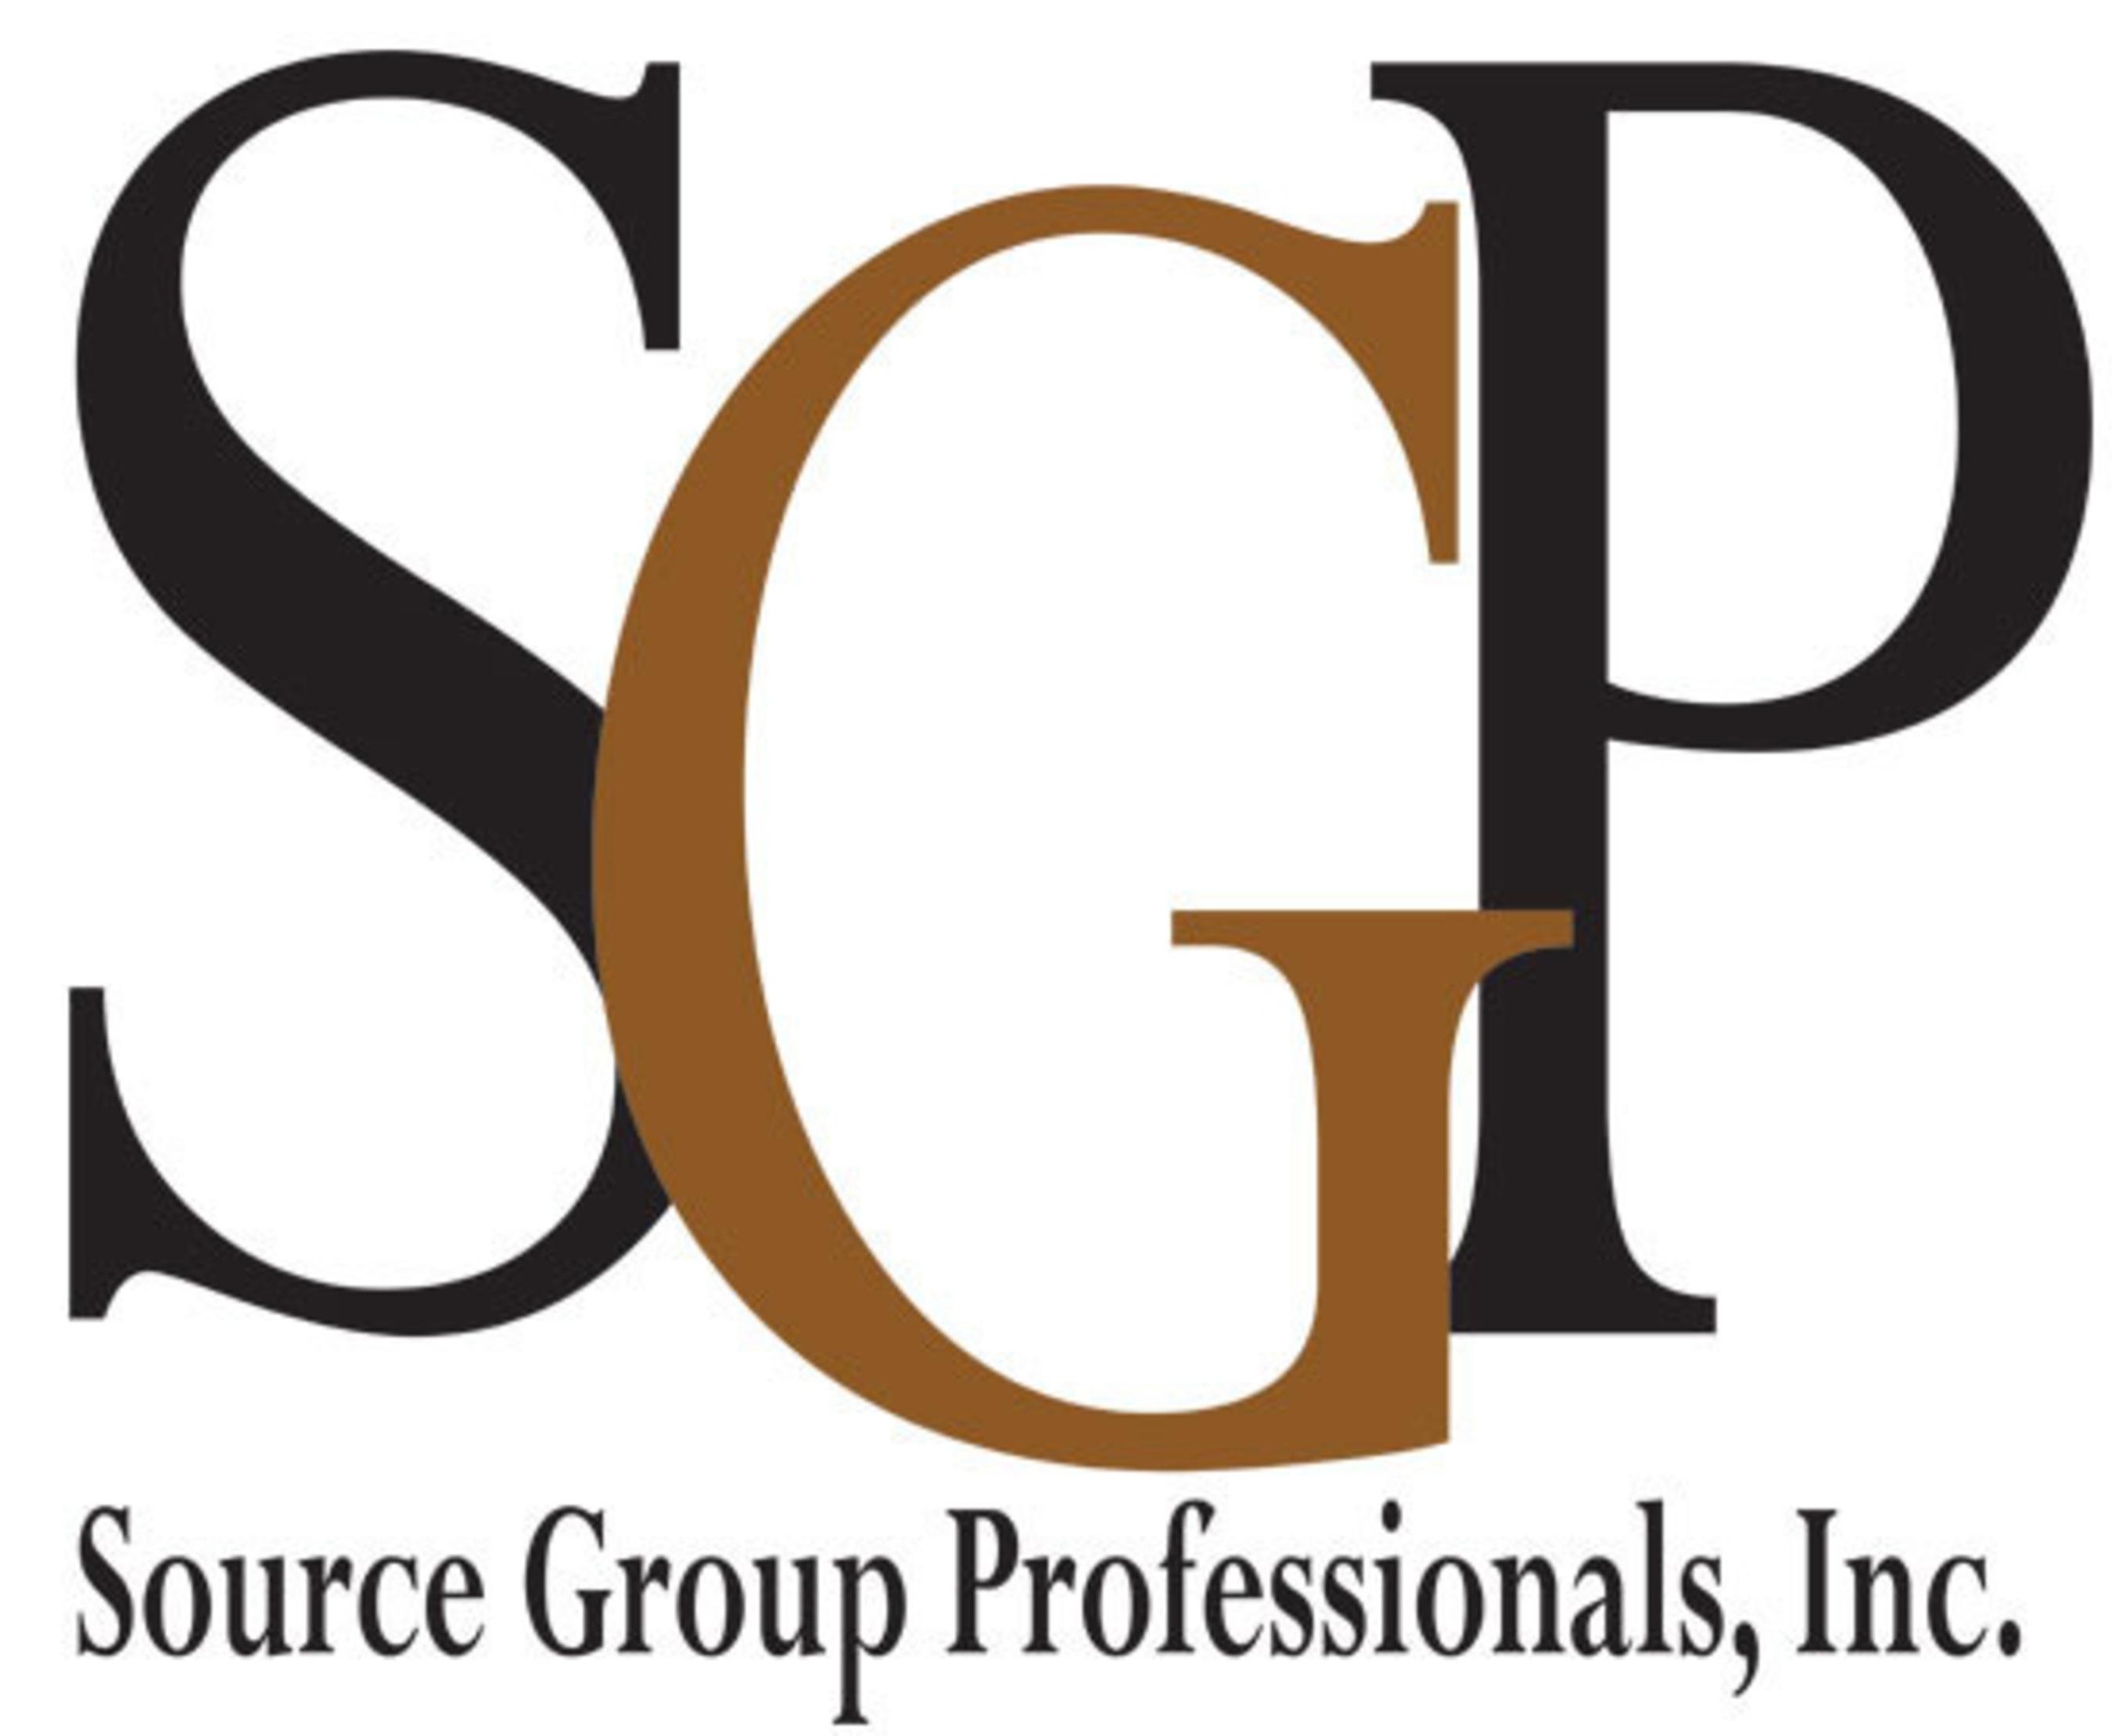 Source Group Professionals, Inc. (PRNewsFoto/Source Group Professionals, Inc.) (PRNewsFoto/SOURCE GROUP PROFESSIONALS, INC.)